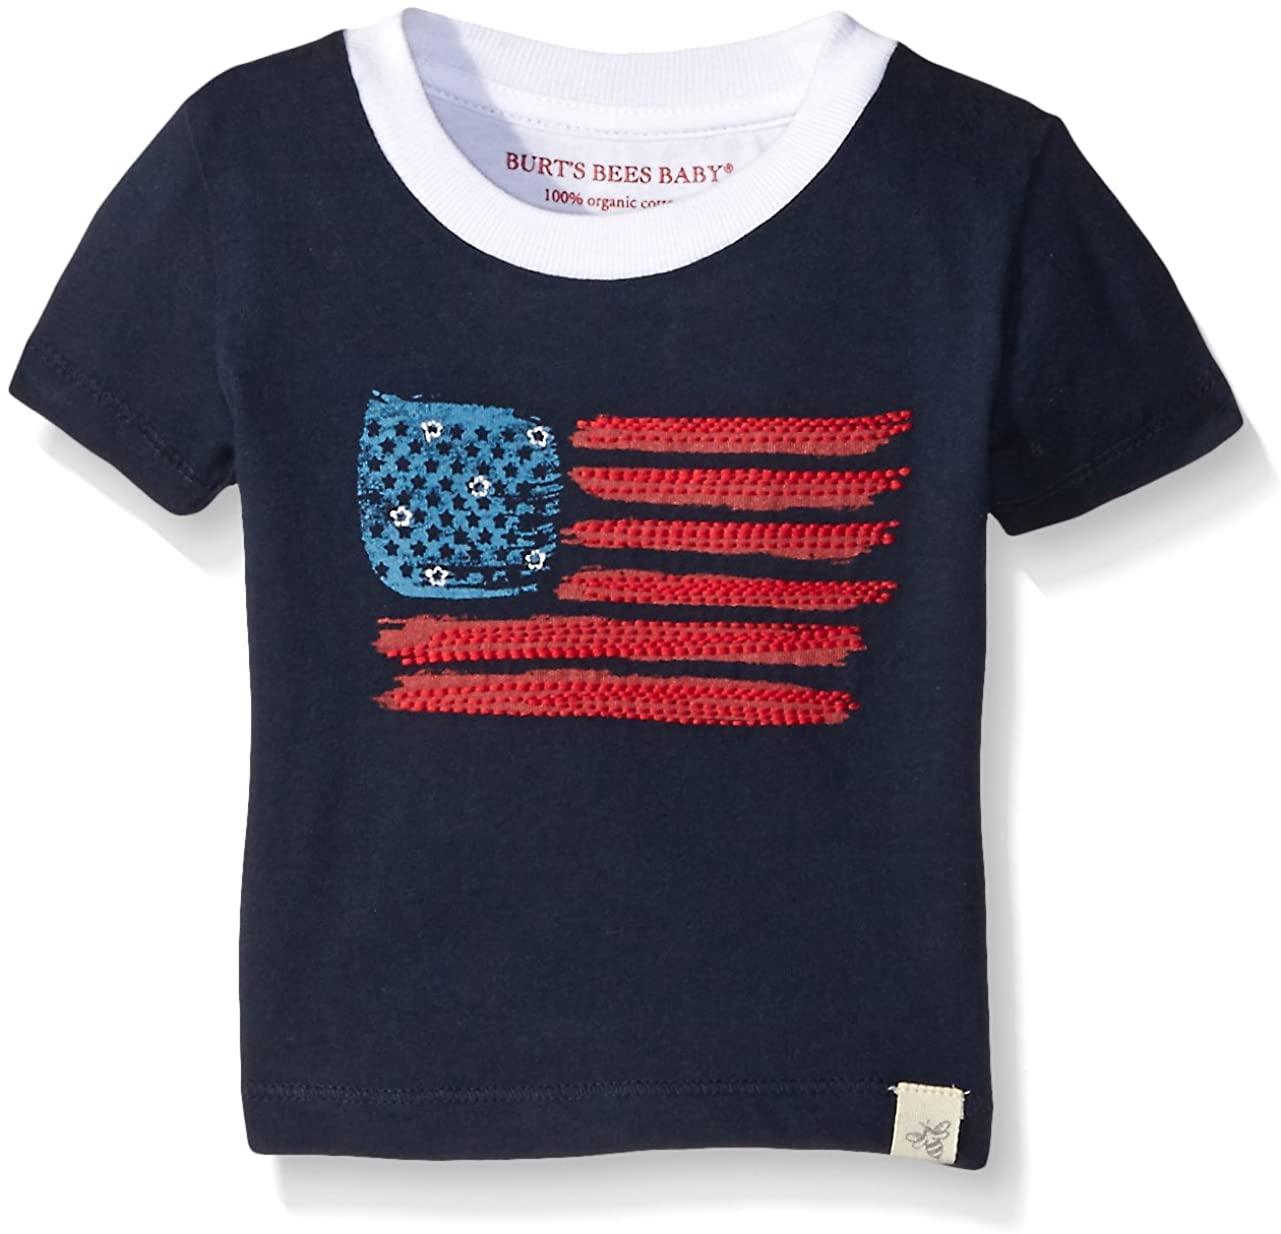 Burts Bees Baby Baby Boys T-Shirt, Short Sleeve V-Neck and Crewneck Tees, 100% Organic Cotton